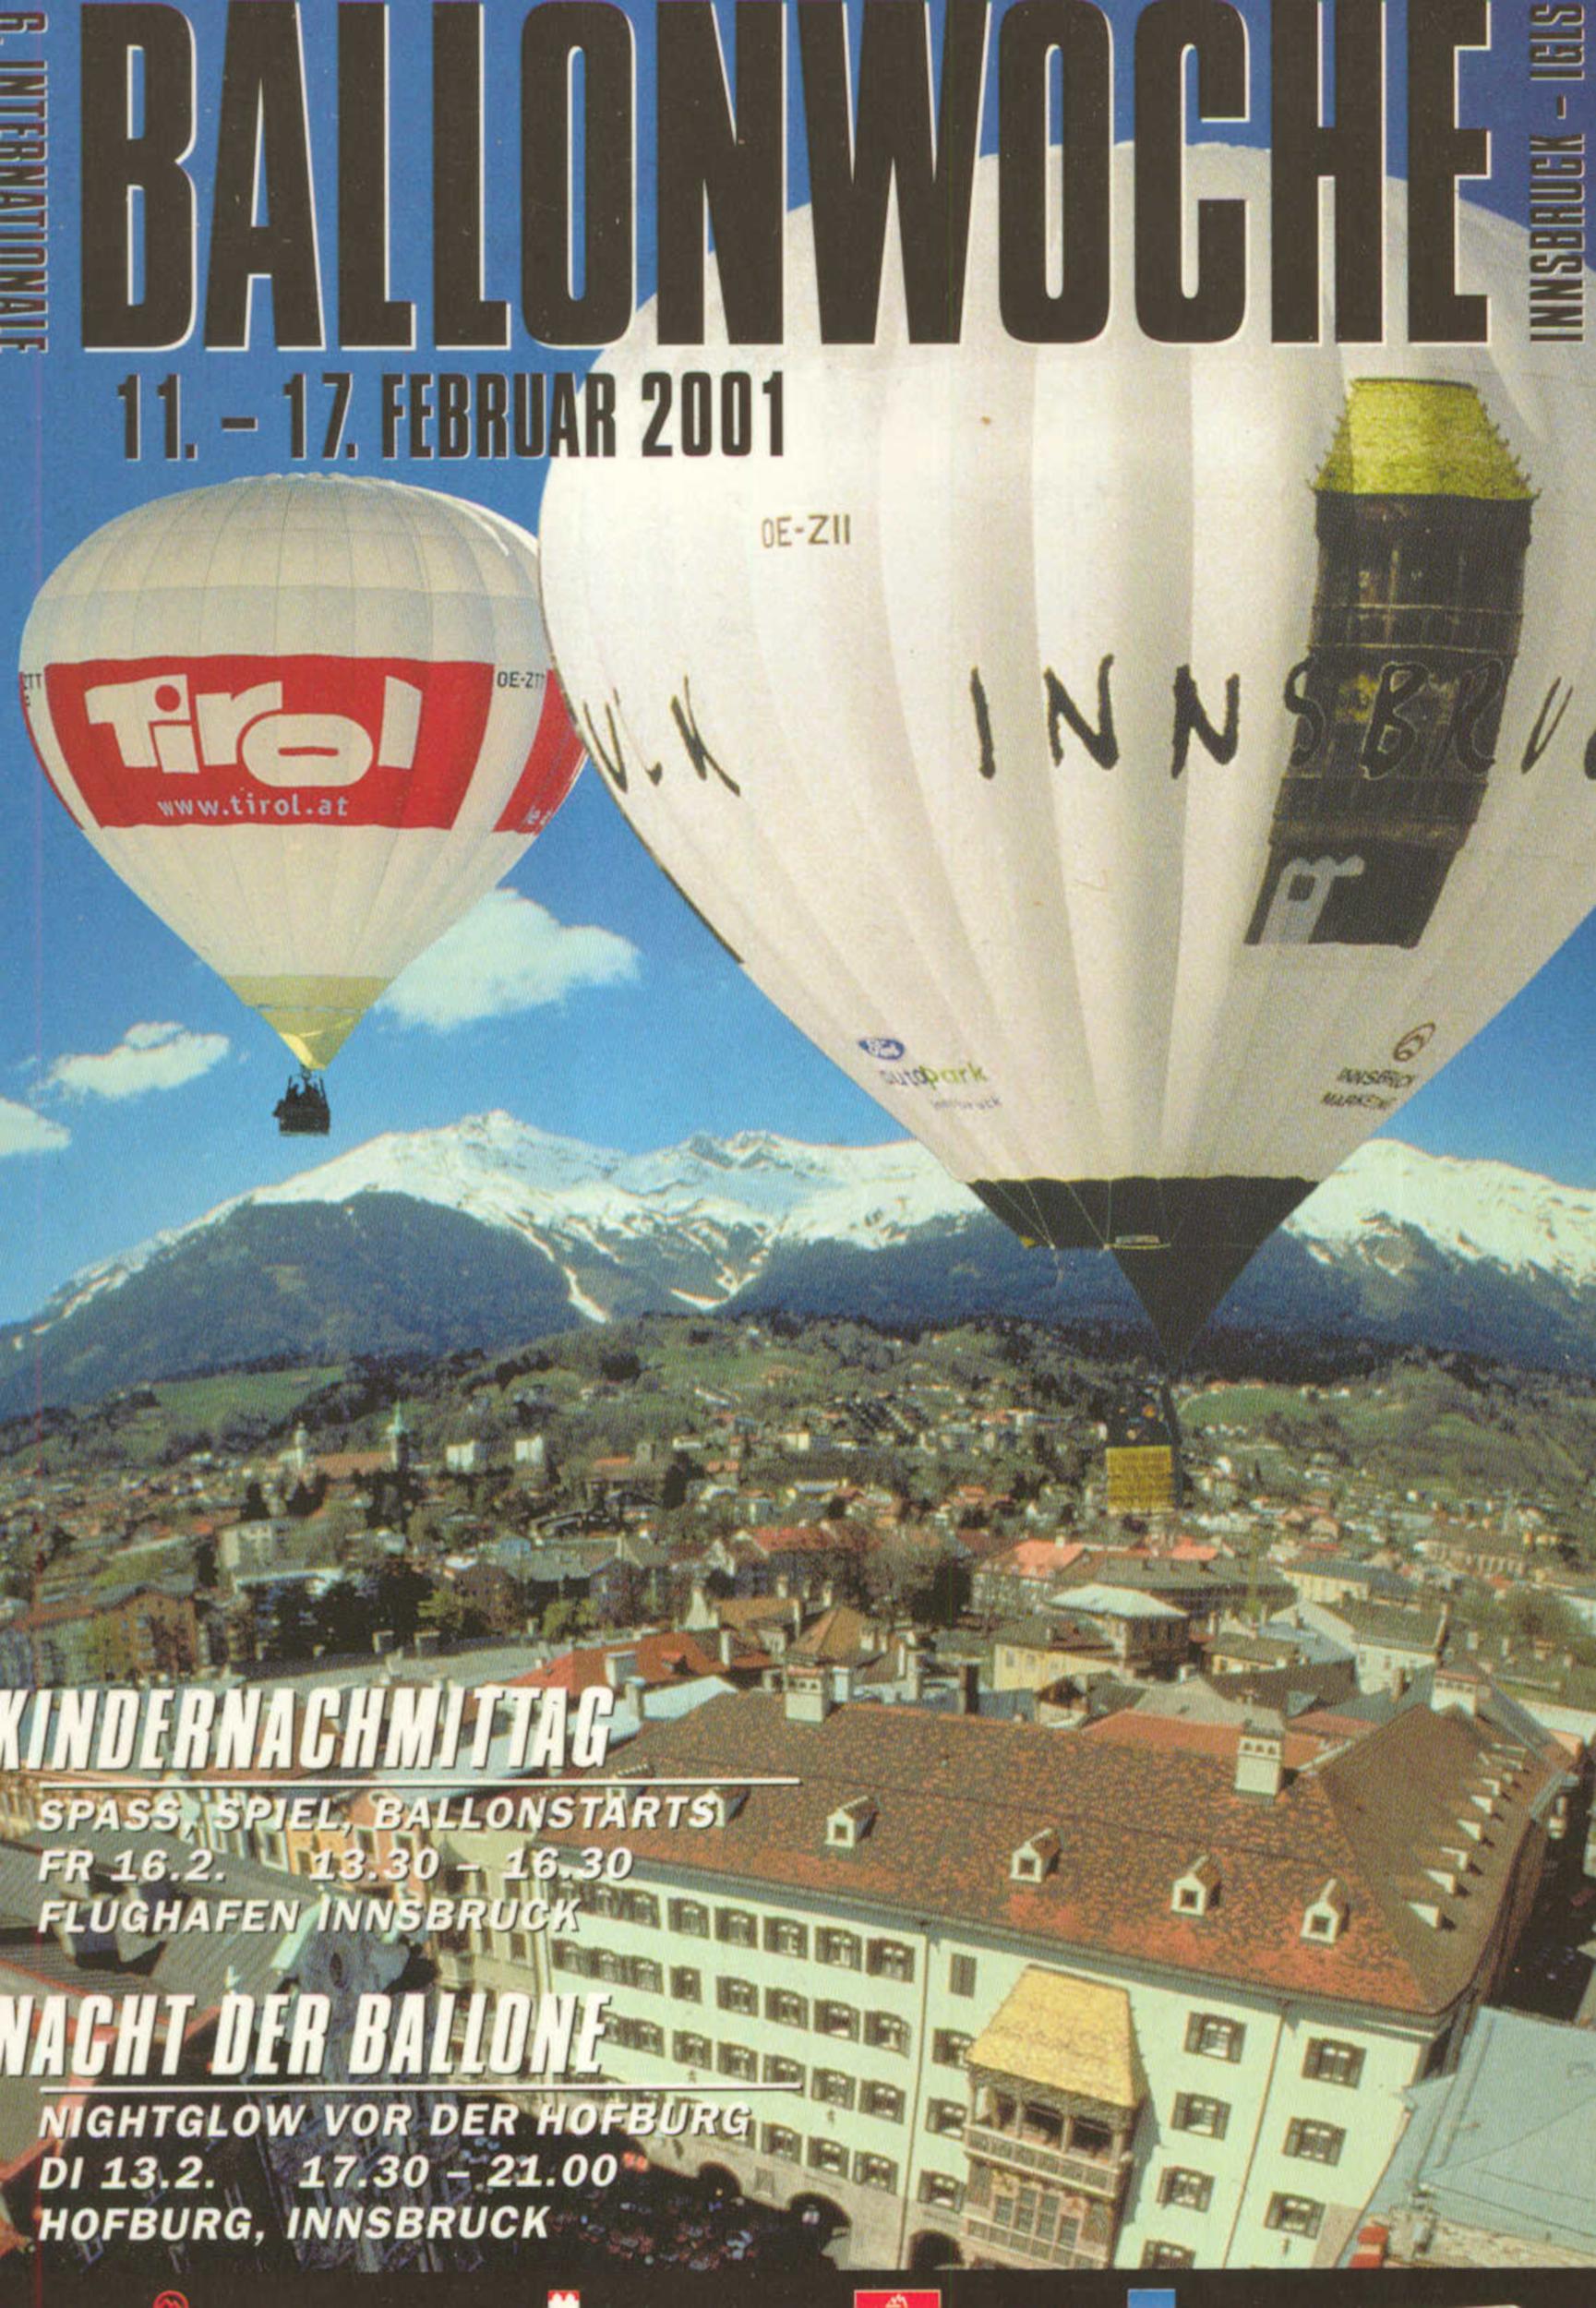 6. Internationale Ballonwoche